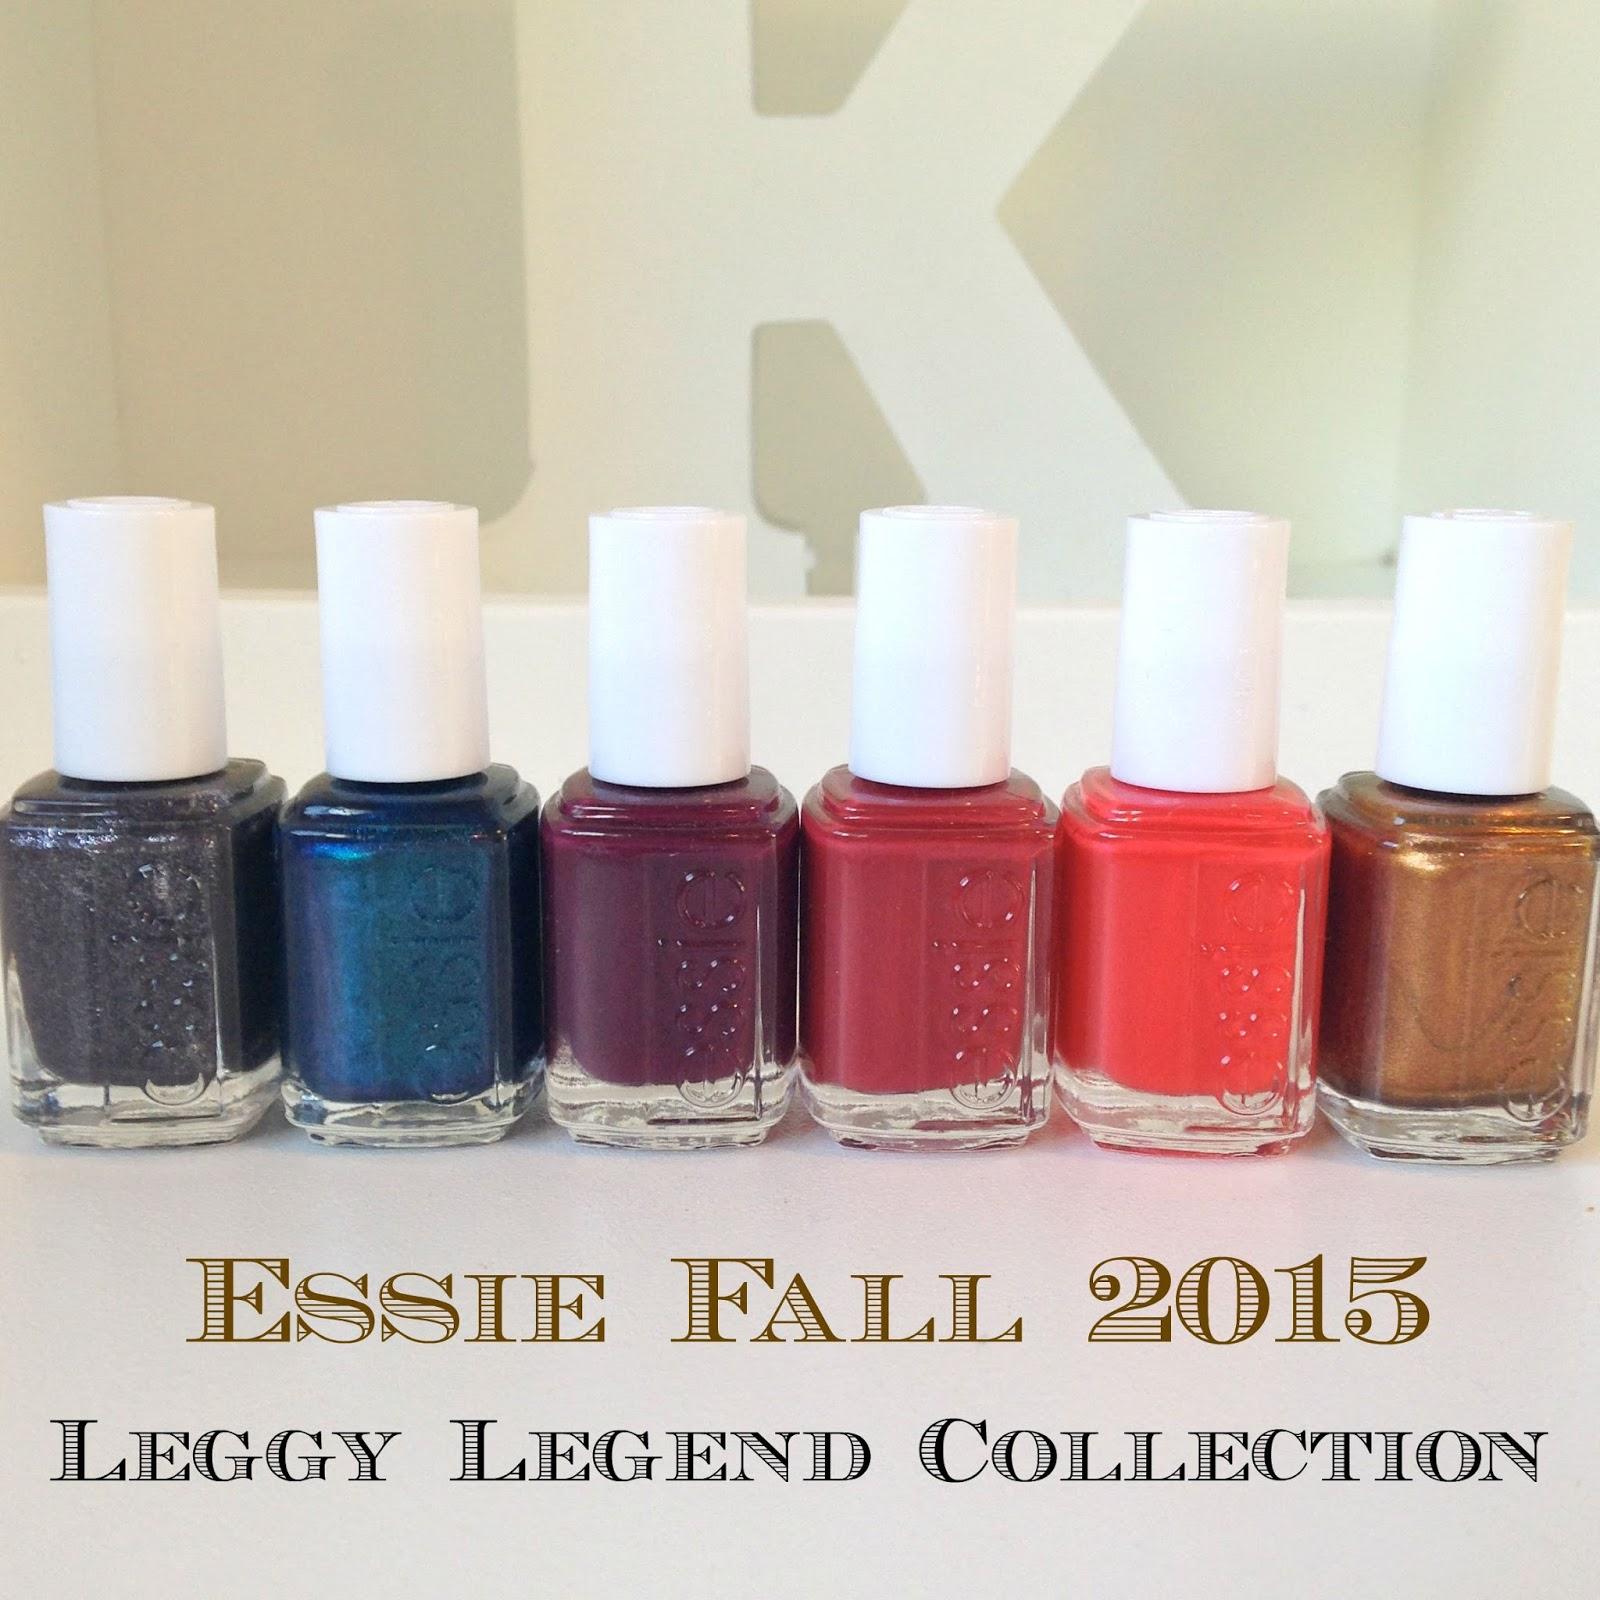 Essie Fall 2015 - Leggy Legend Collection | Essie Envy